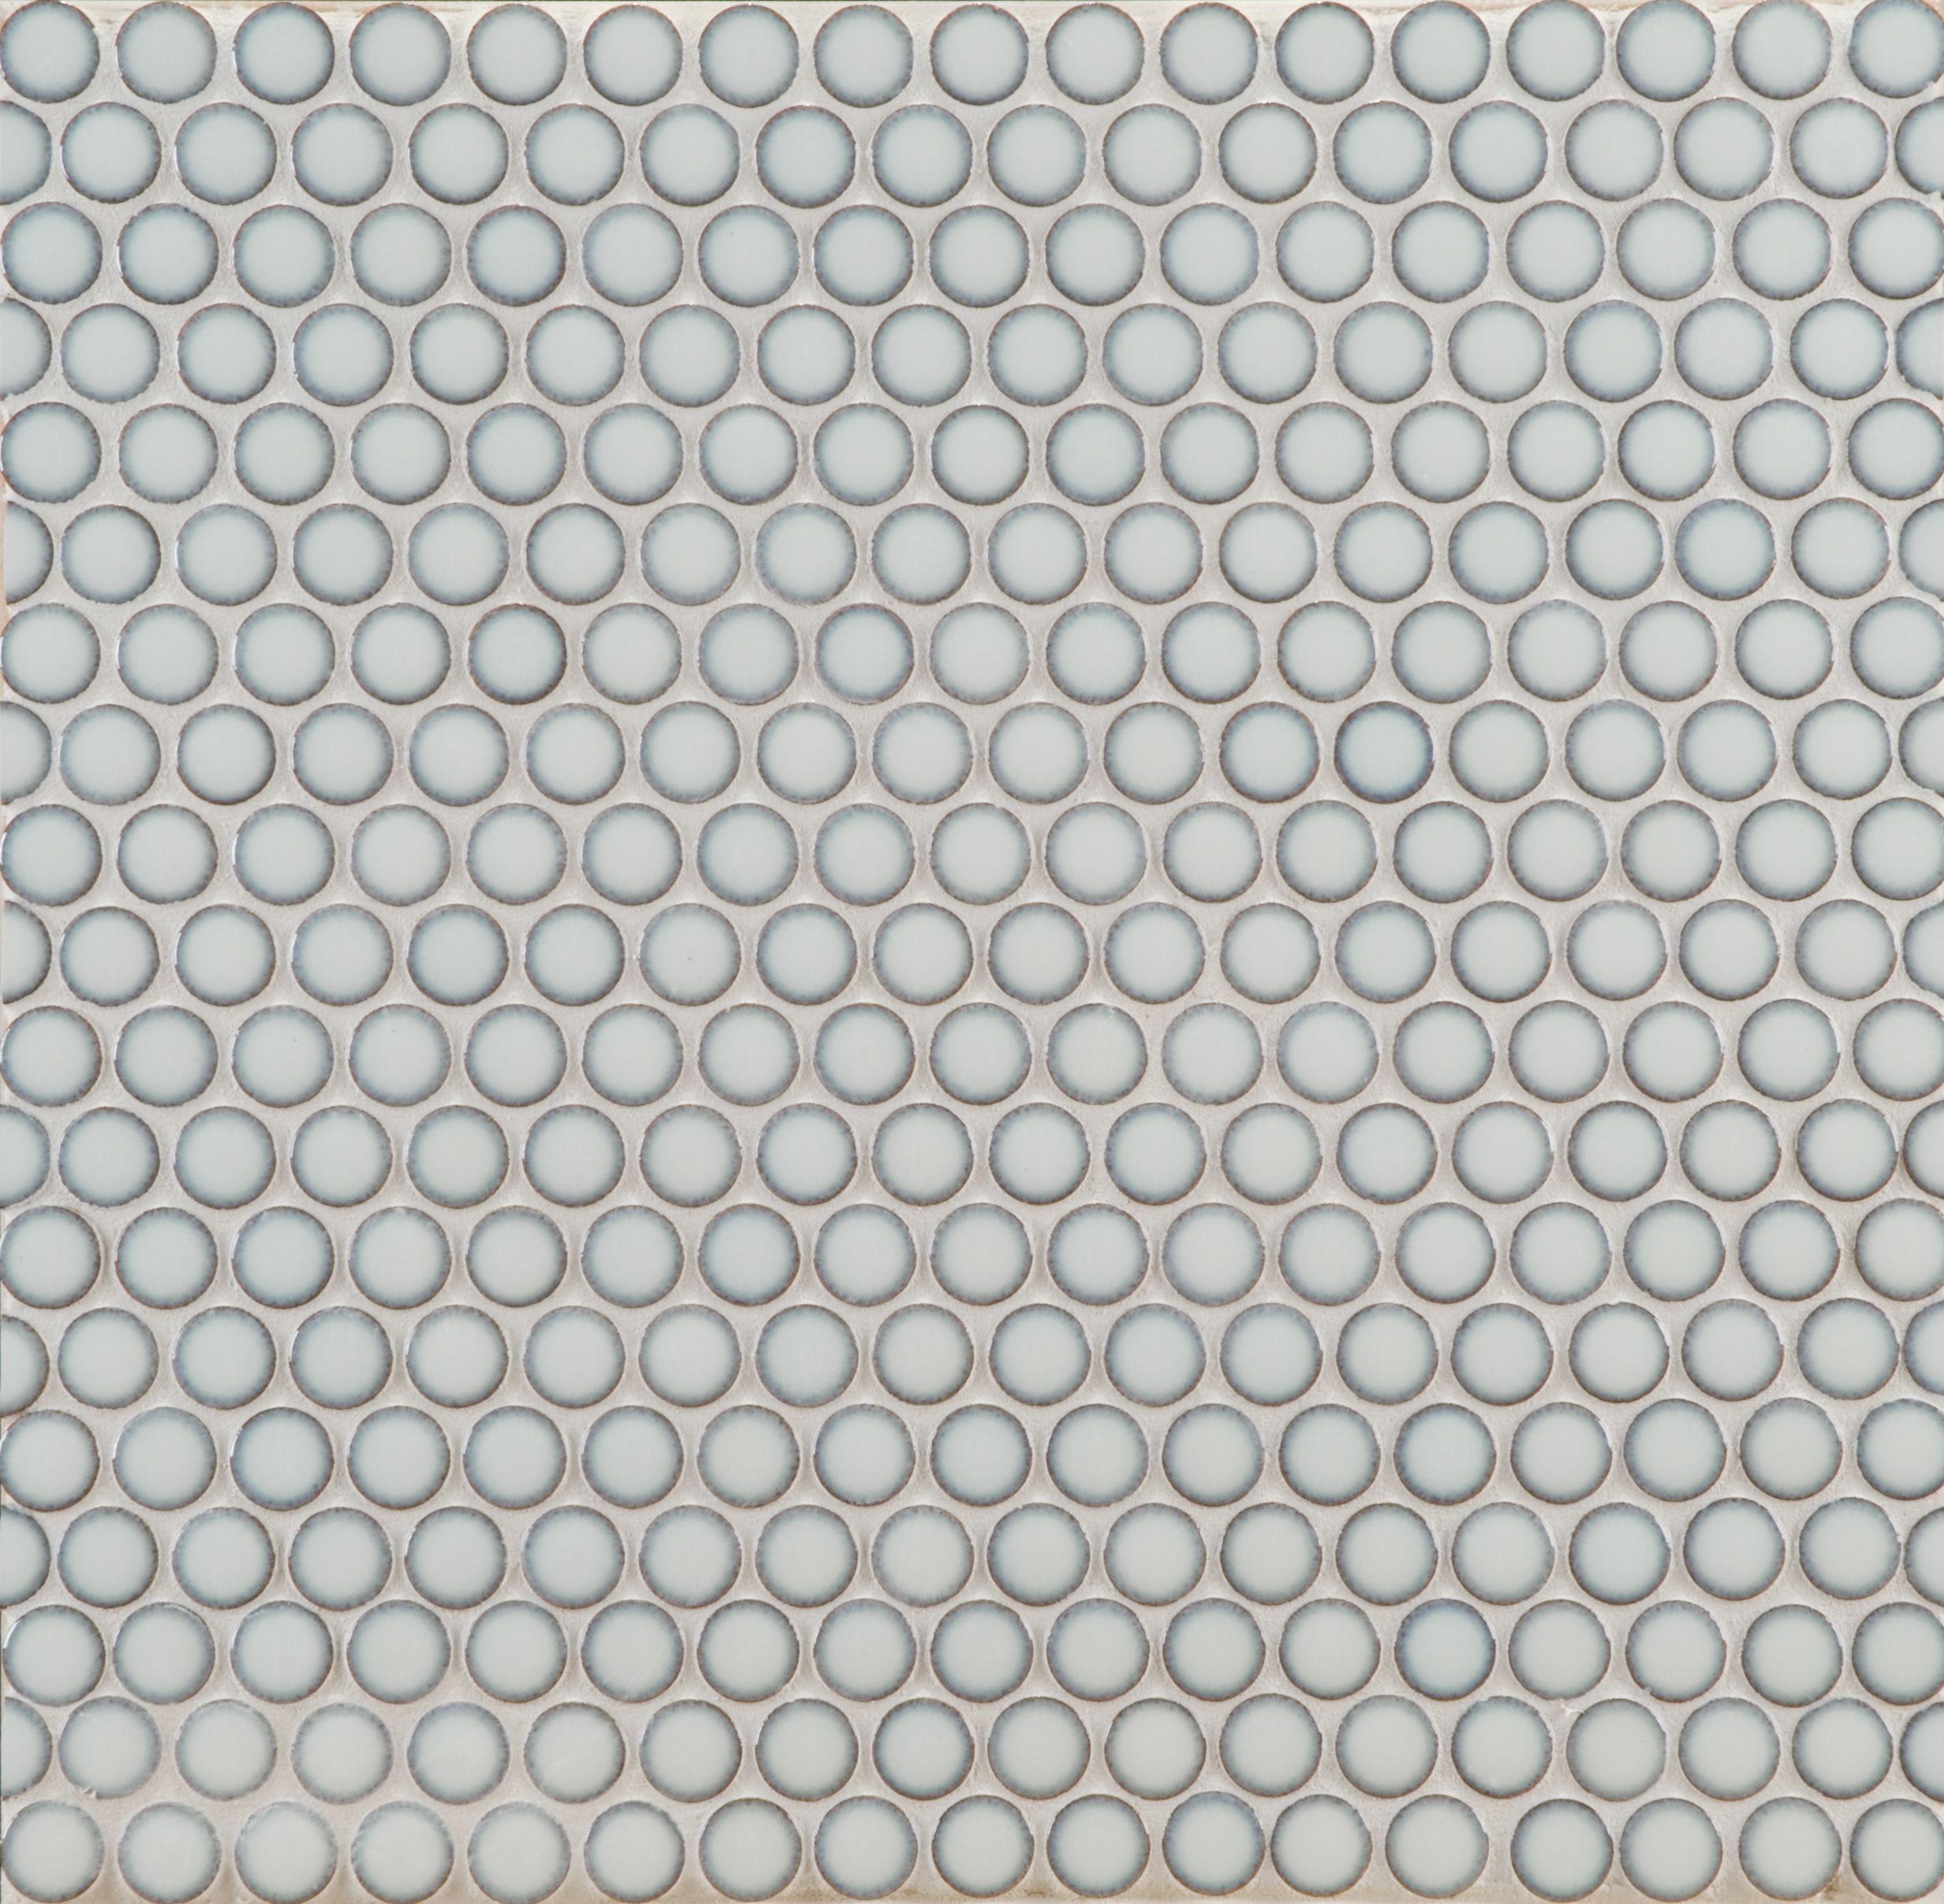 Ann Sacks Mosaic Bathroom Tile: ANN SACKS Savoy Penny Round Ceramic Mosaic In Cottonwood